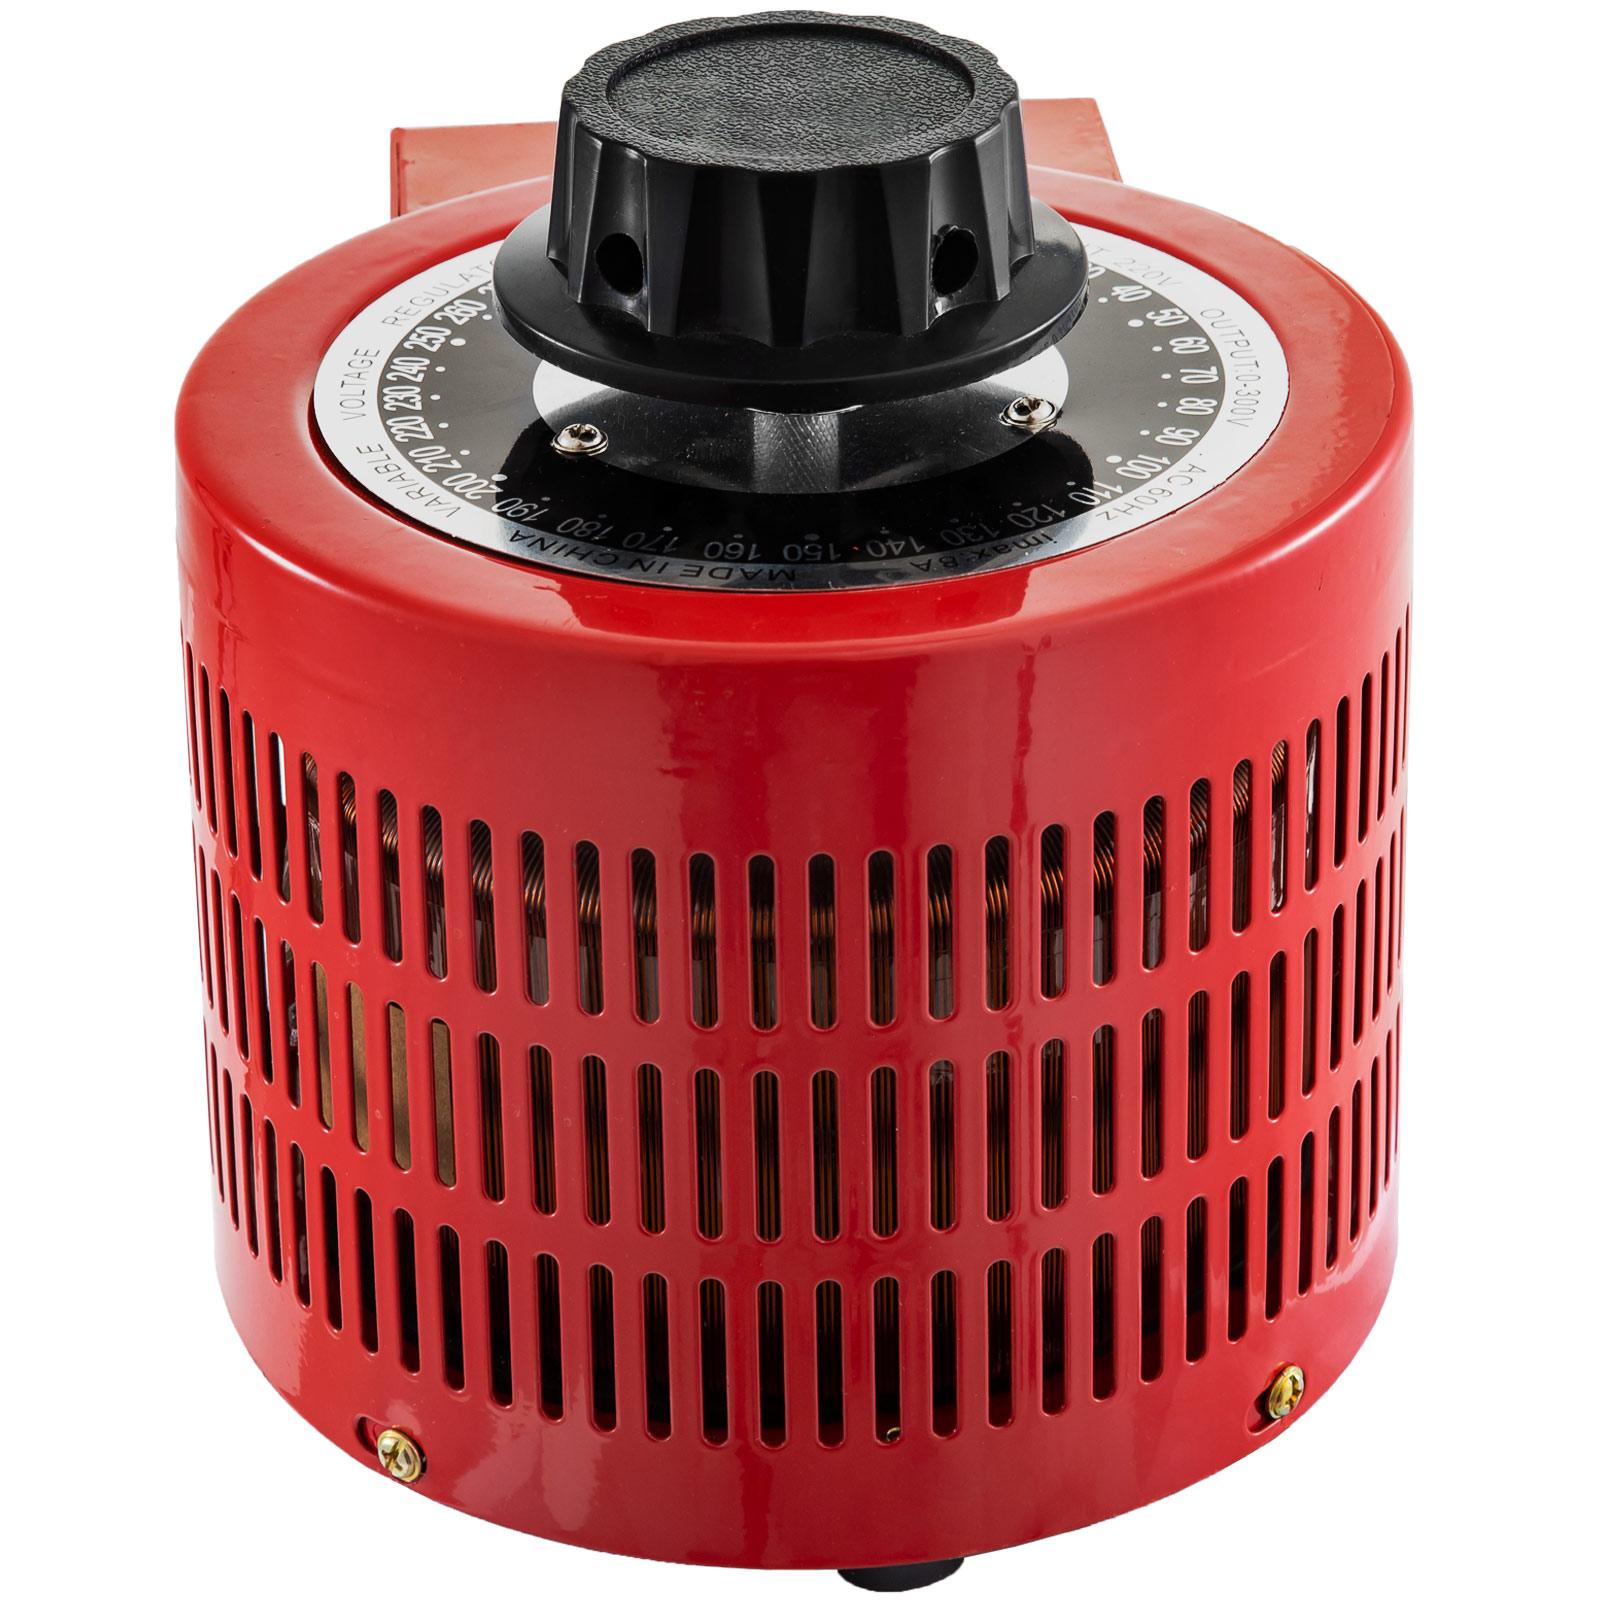 Auto-Variac-Variable-Transformer-0-5-1-2-3KVA-Regulator-pure-copper-coil-220V thumbnail 47